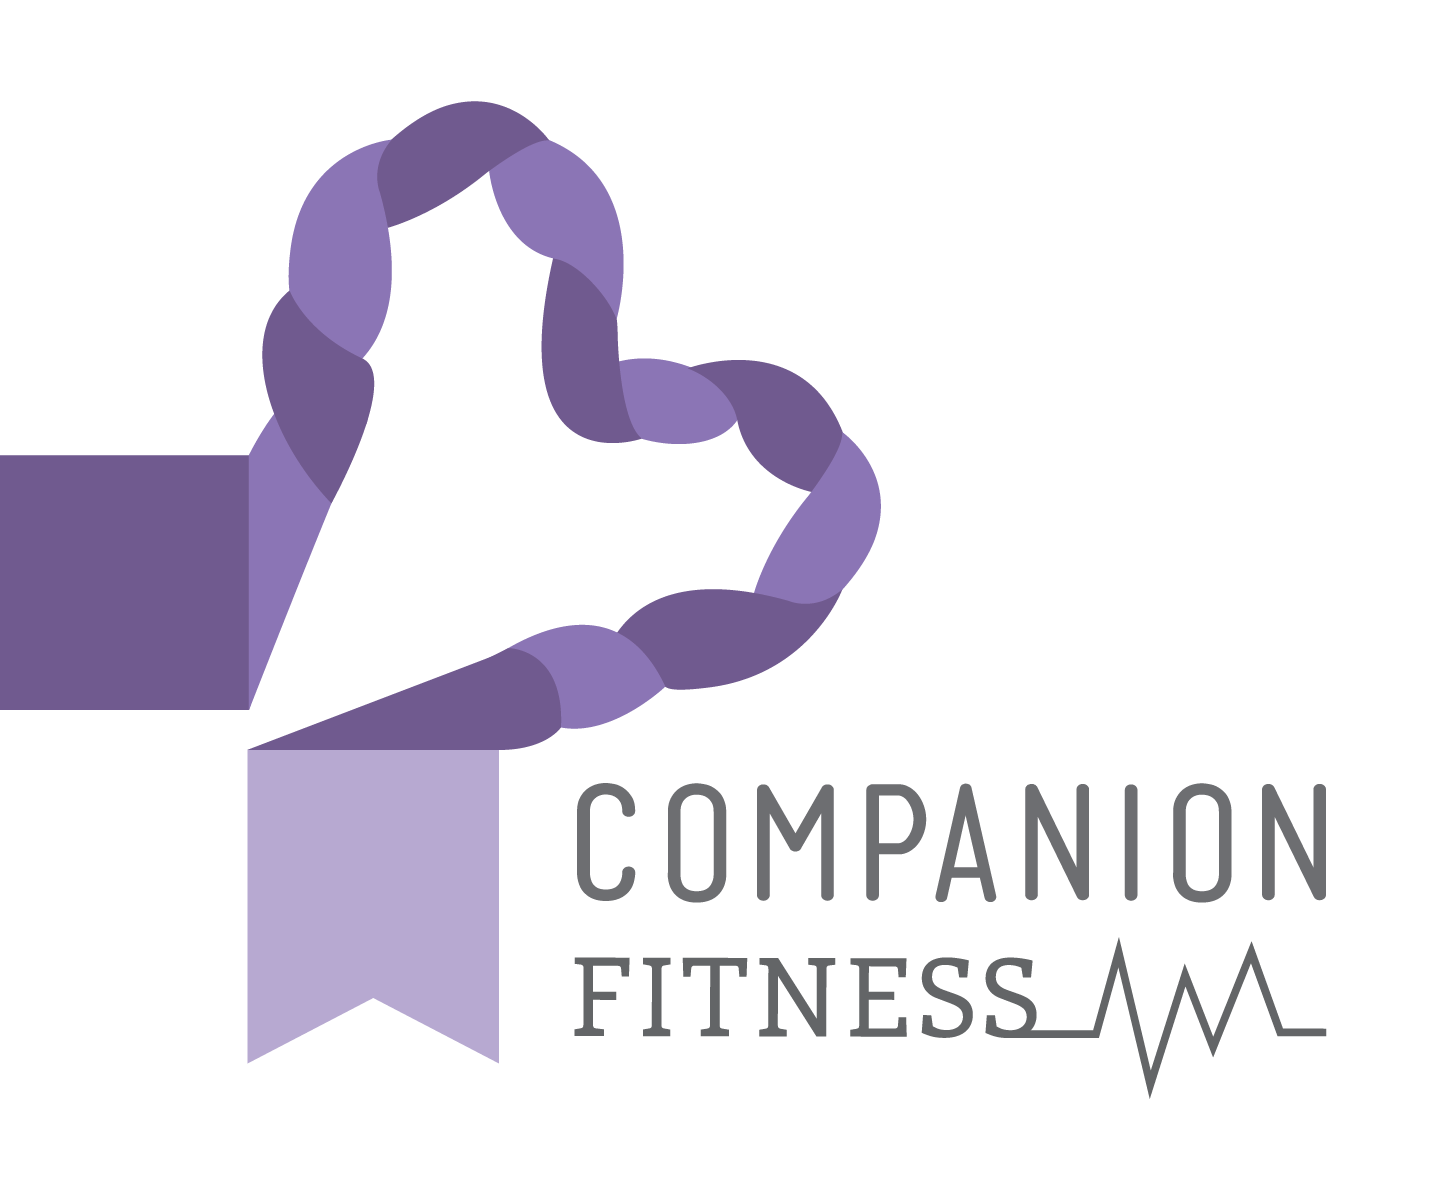 Companion_FitnessLong.png